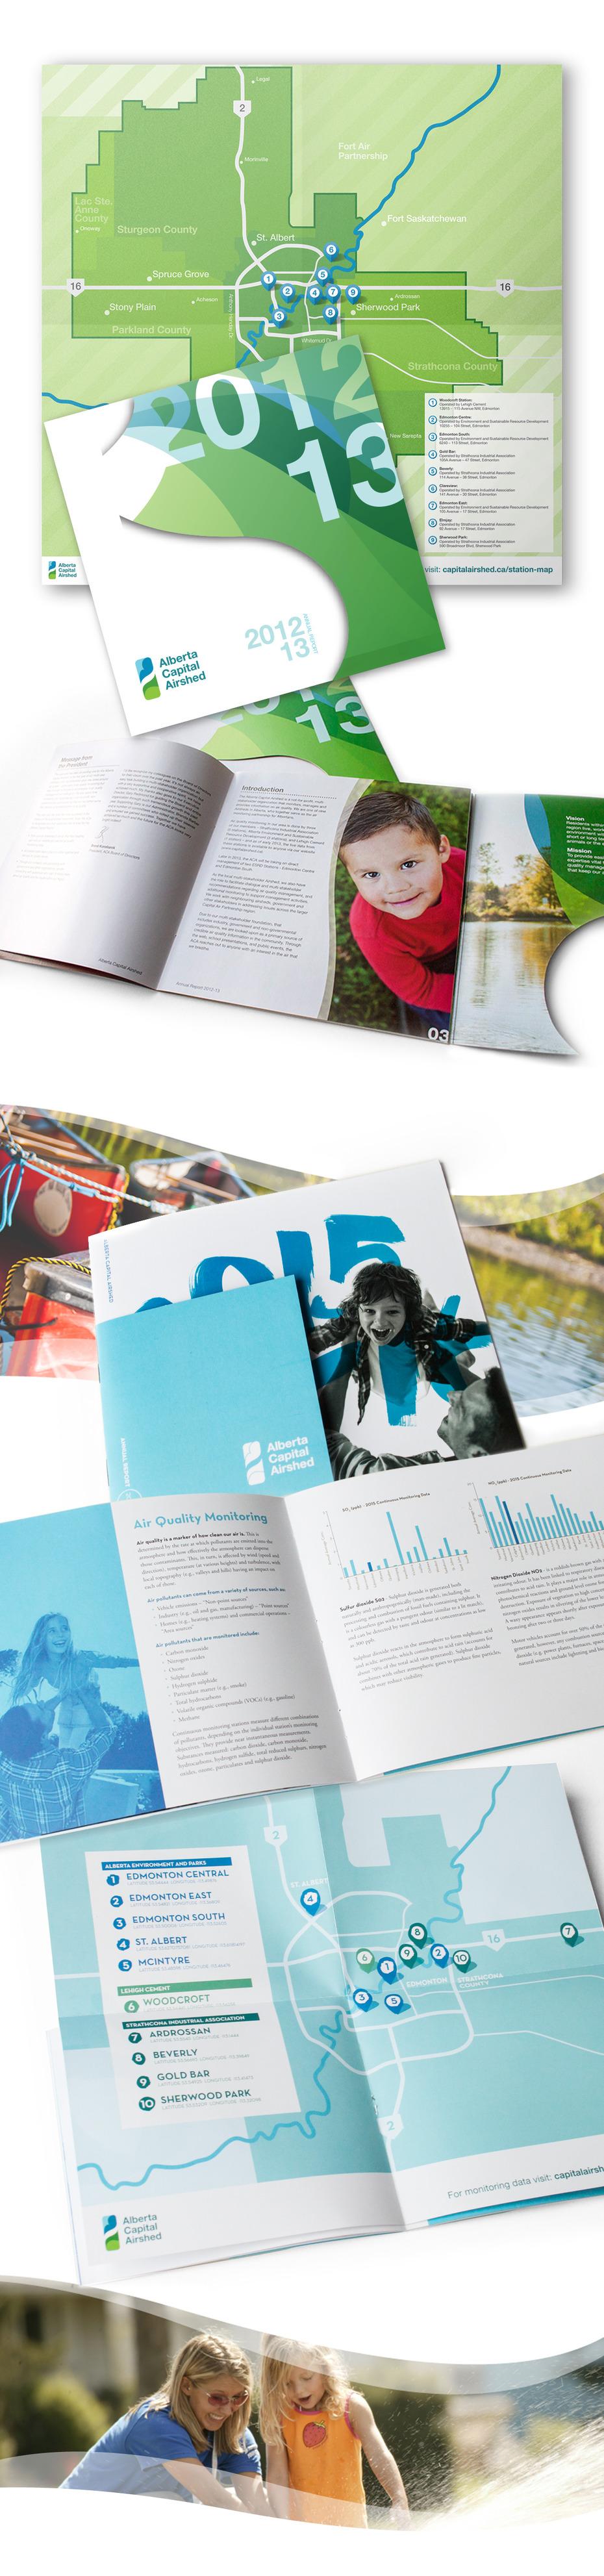 Acac portfoliomock print